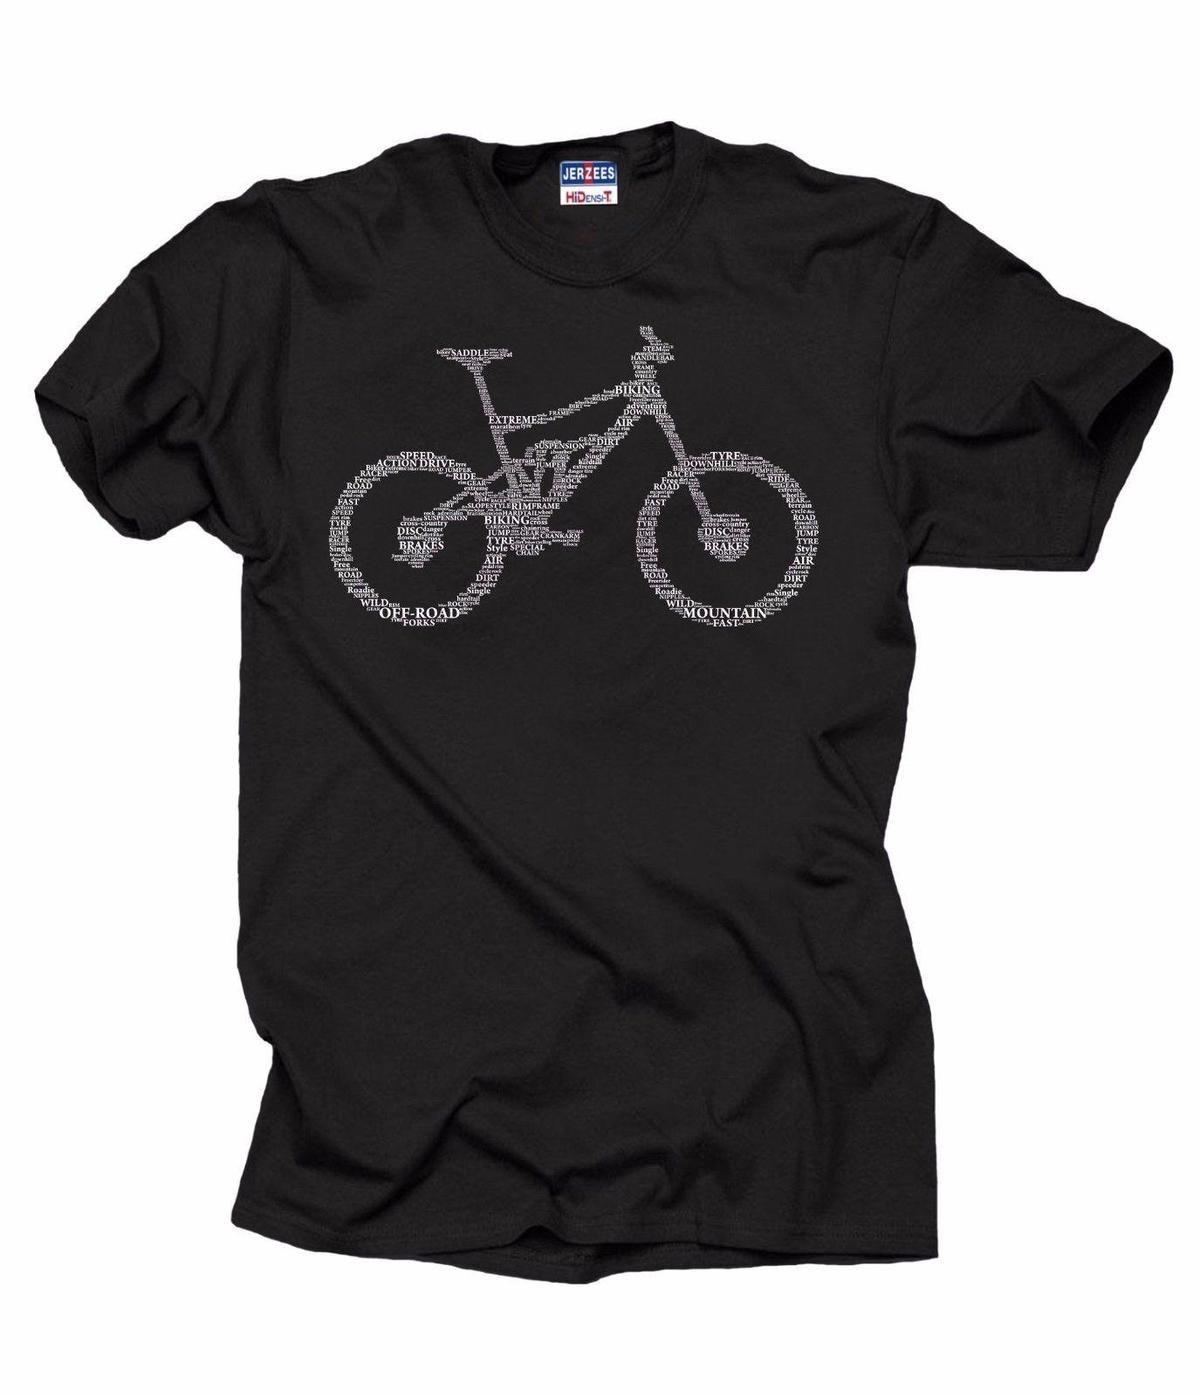 d9fcbe21 Bicycle Parts T Shirt BMX Fan Tee ShirtMens 2018 Fashion Brand T Shirt O  Neck 100%cotton T Shirt Tops Tee Custom Environmenta Create T Shirt Movie T  Shirts ...